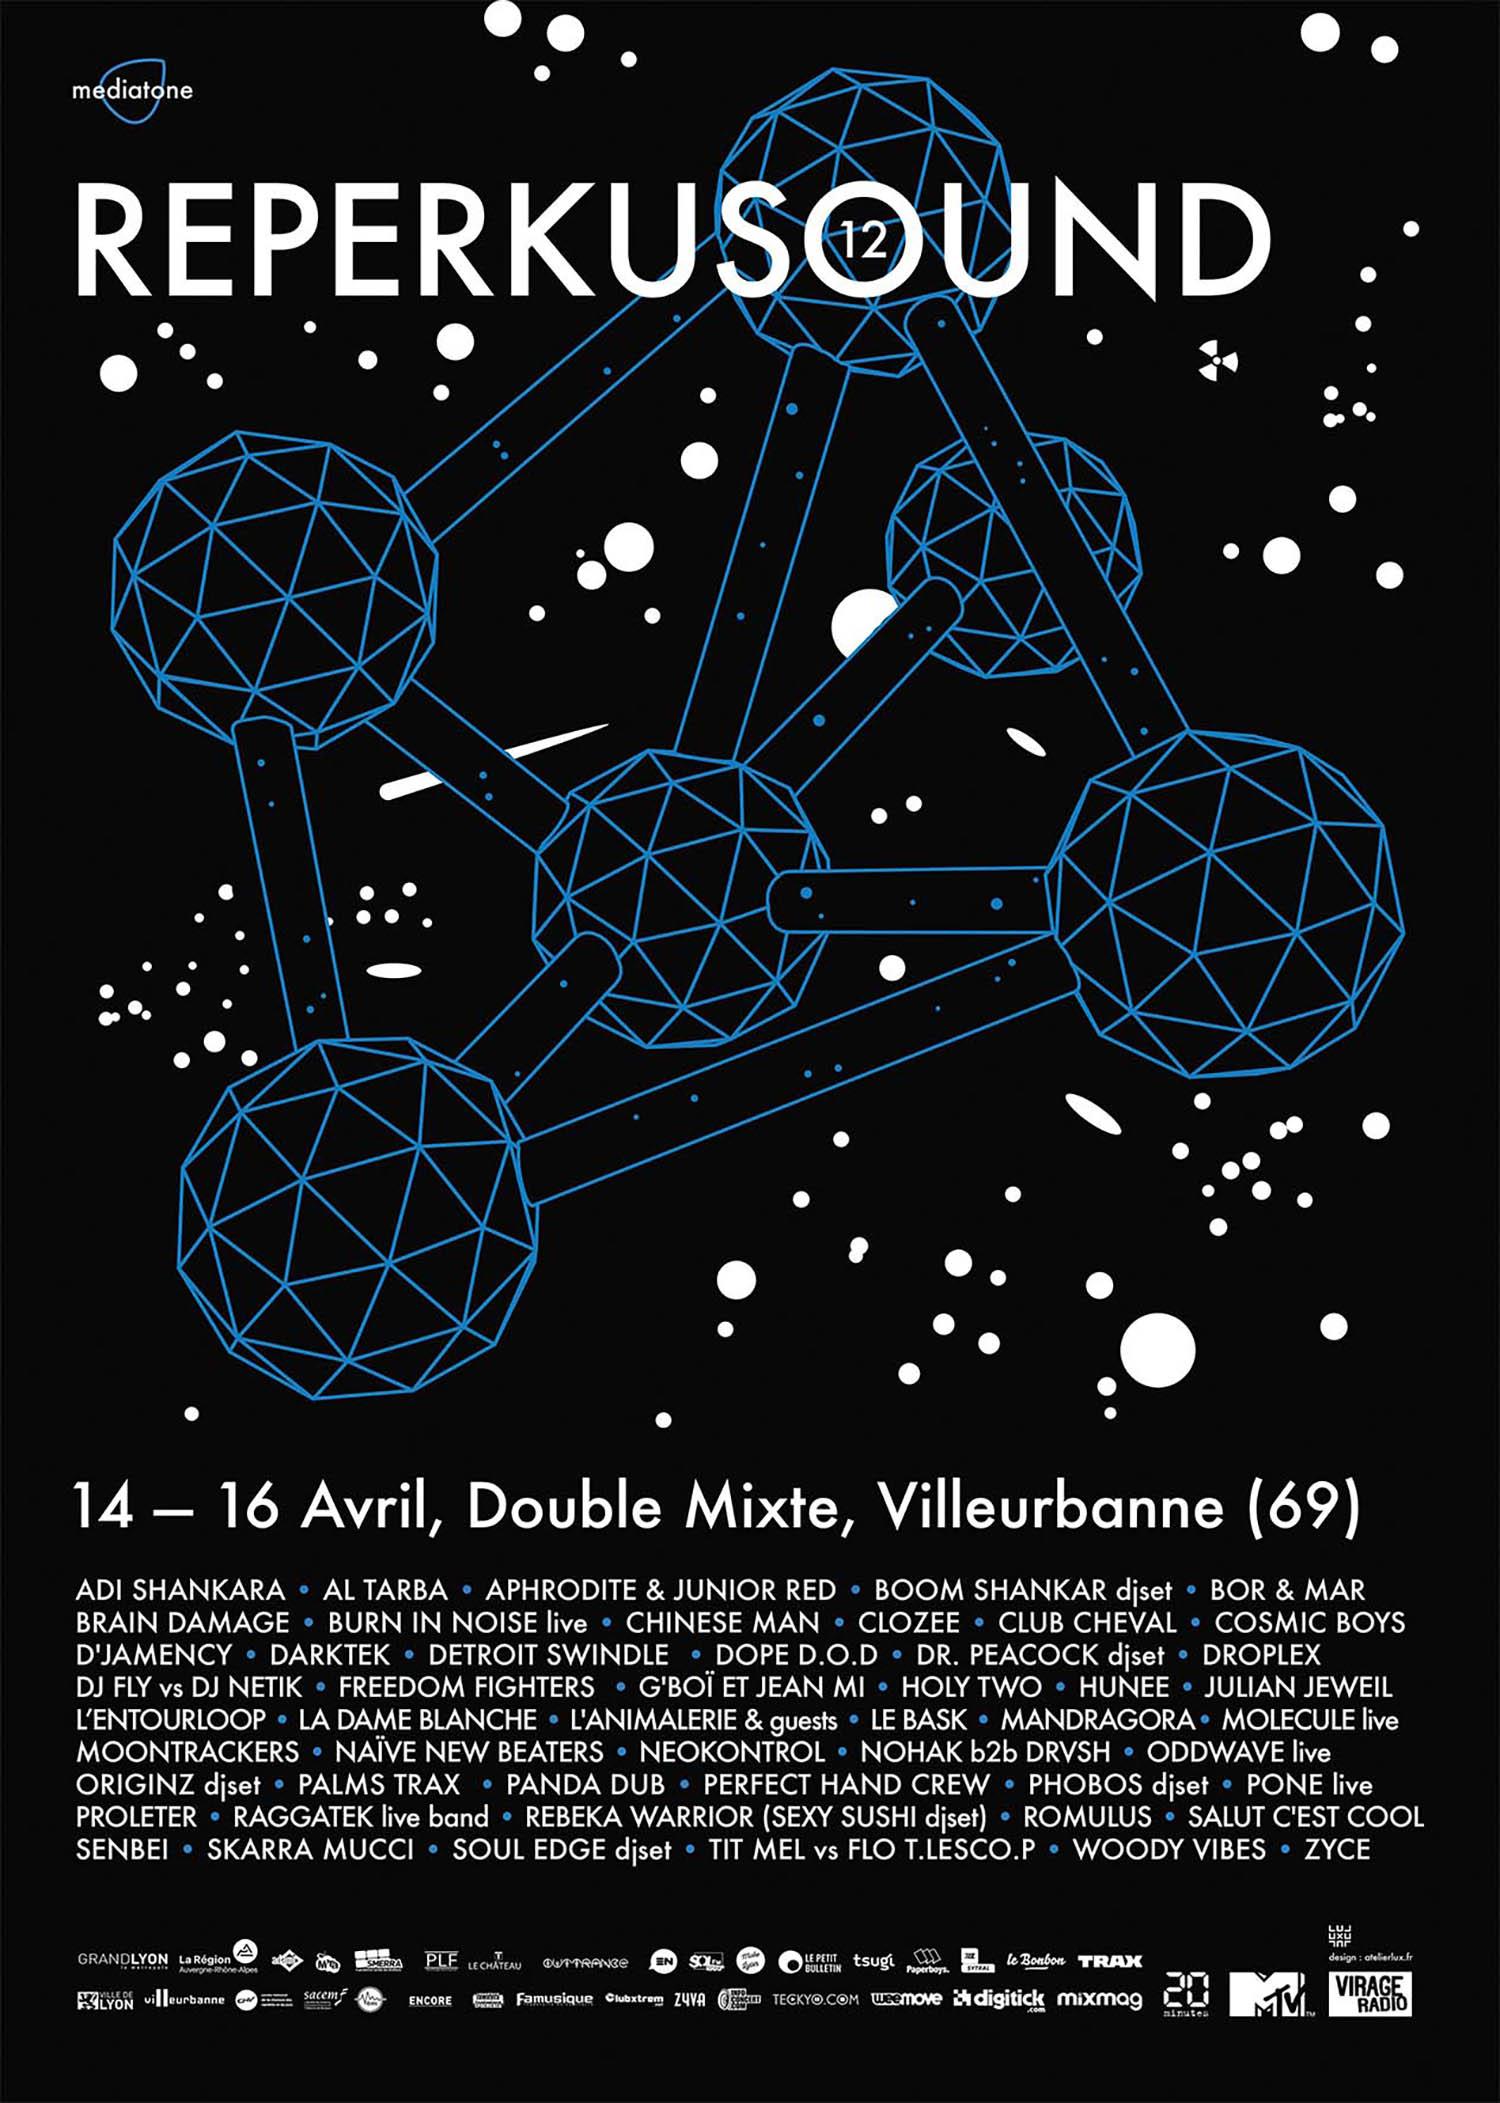 Festival-Reperkusound-12-Lyon